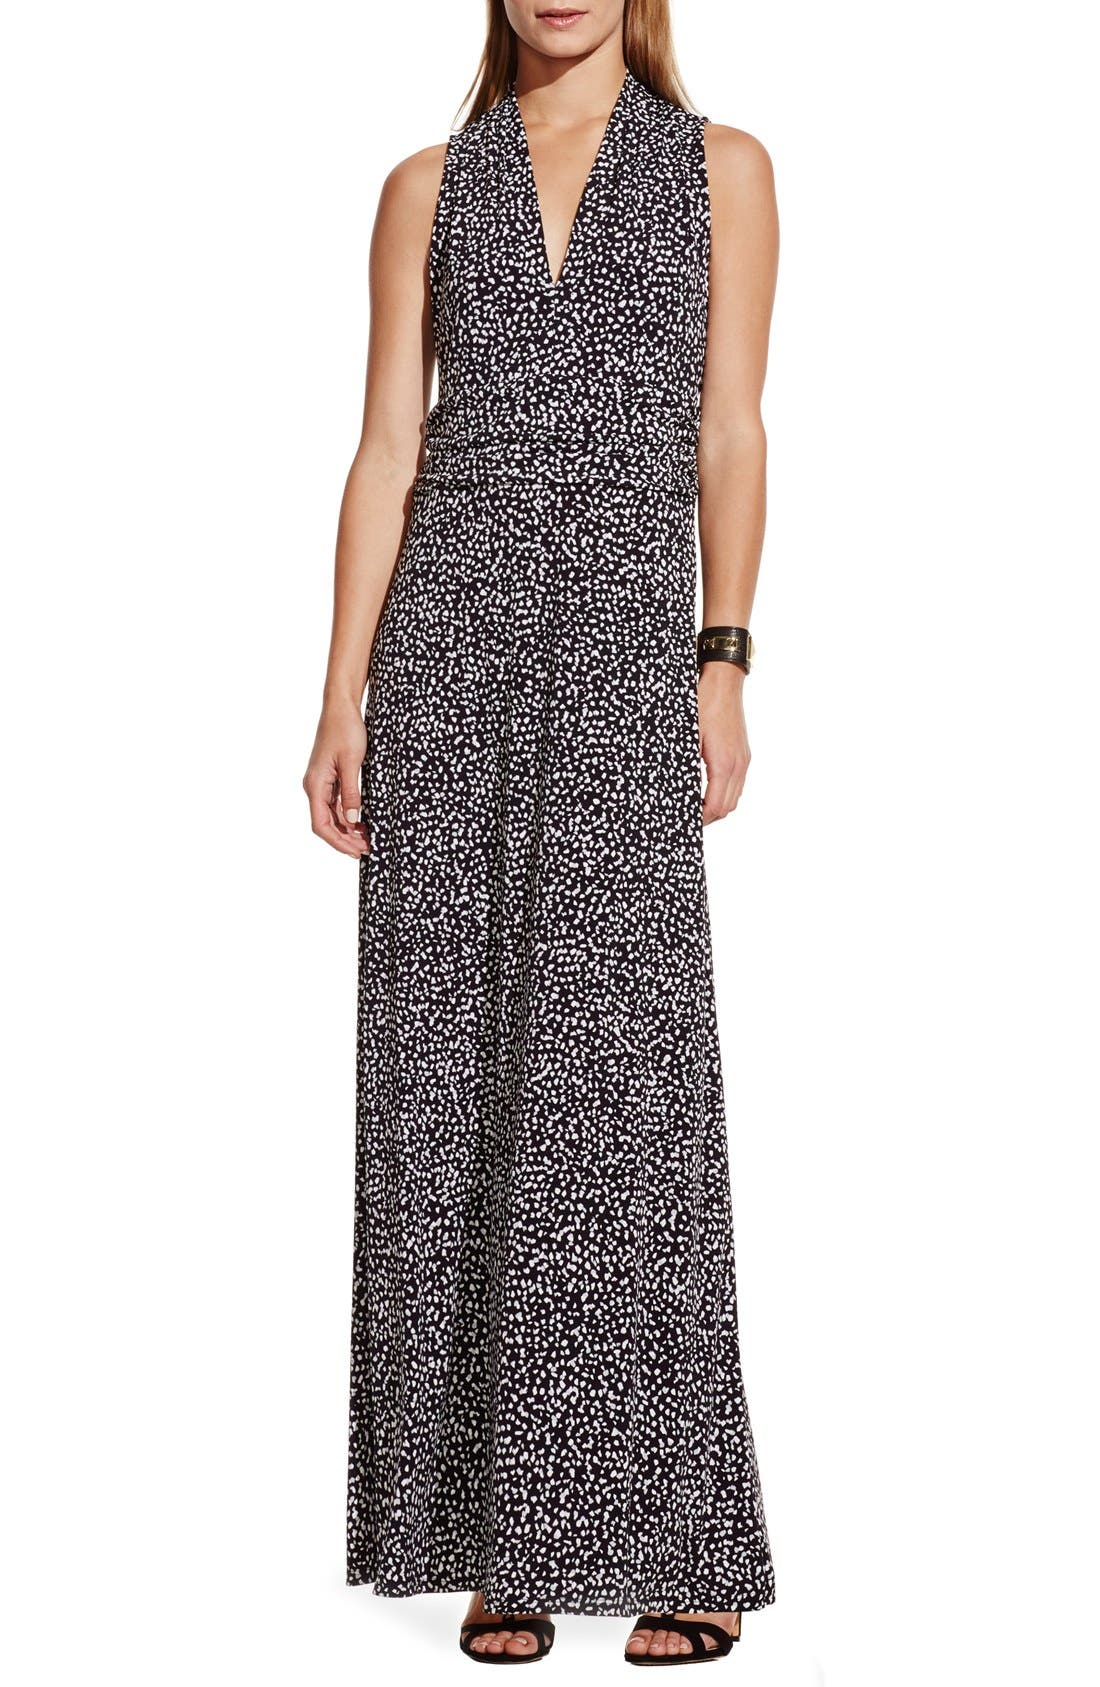 Alternate Image 1 Selected - Vince Camuto Dot Print V-Neck Maxi Dress